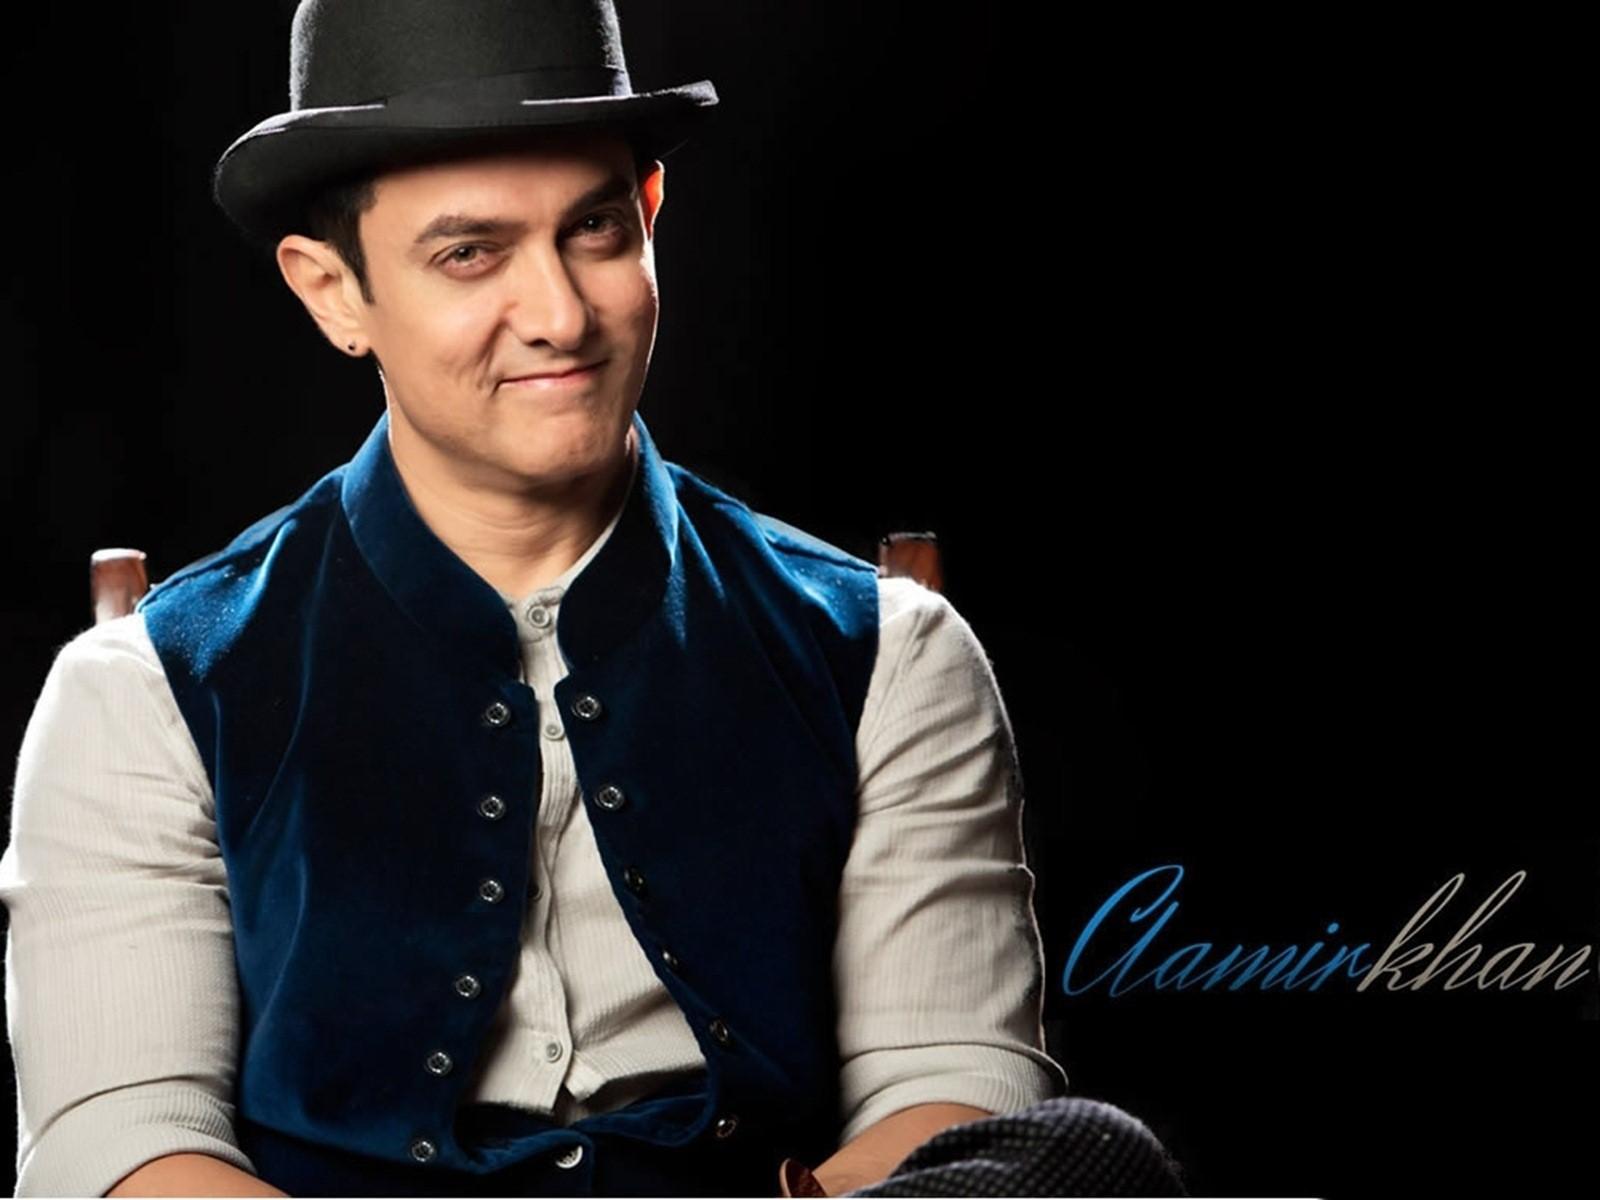 Aamir Khan Wallpapers HD Backgrounds Images Pics Photos 1600x1200